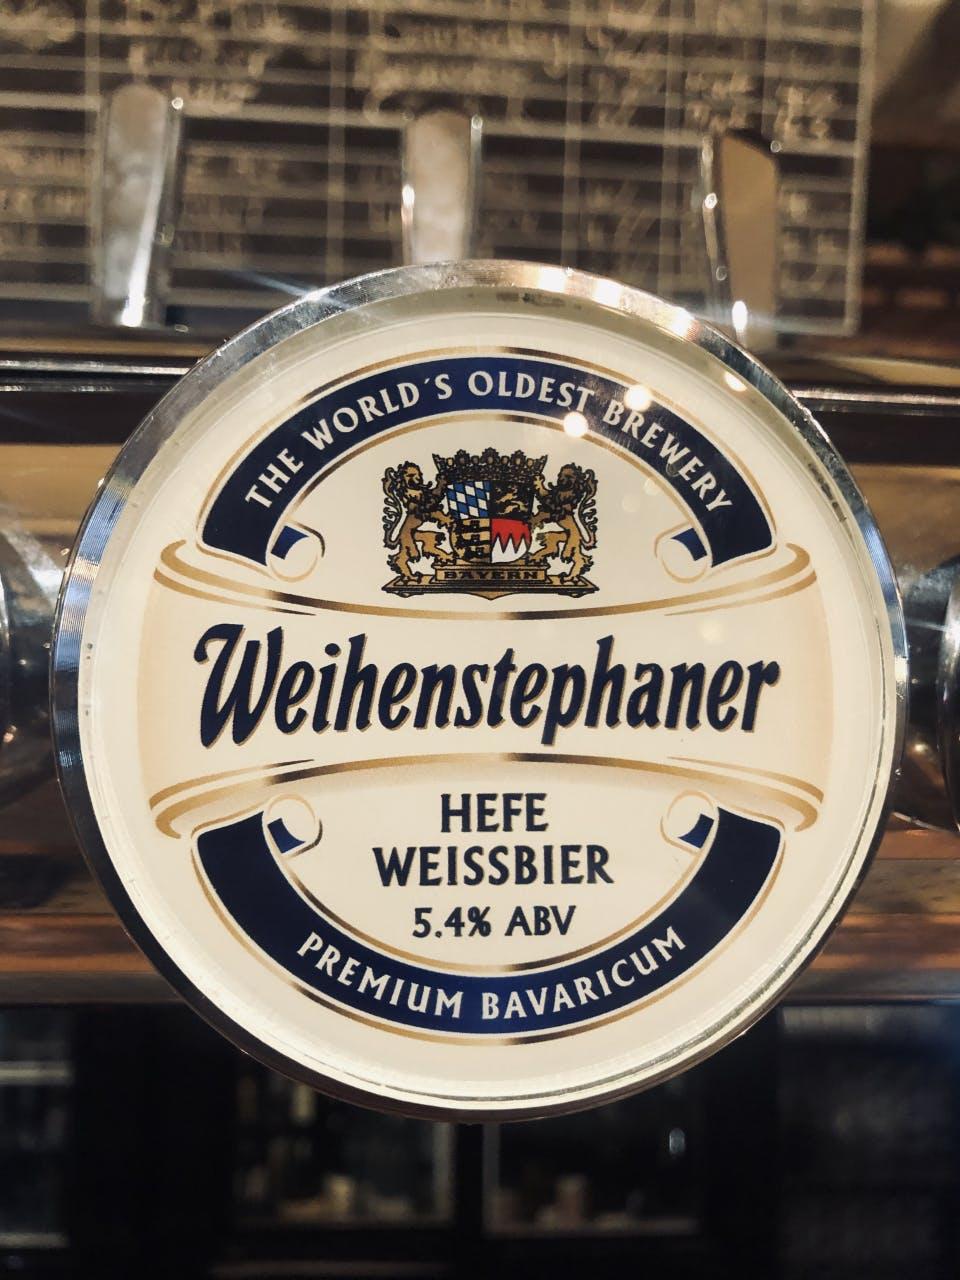 World's Oldest Brewery